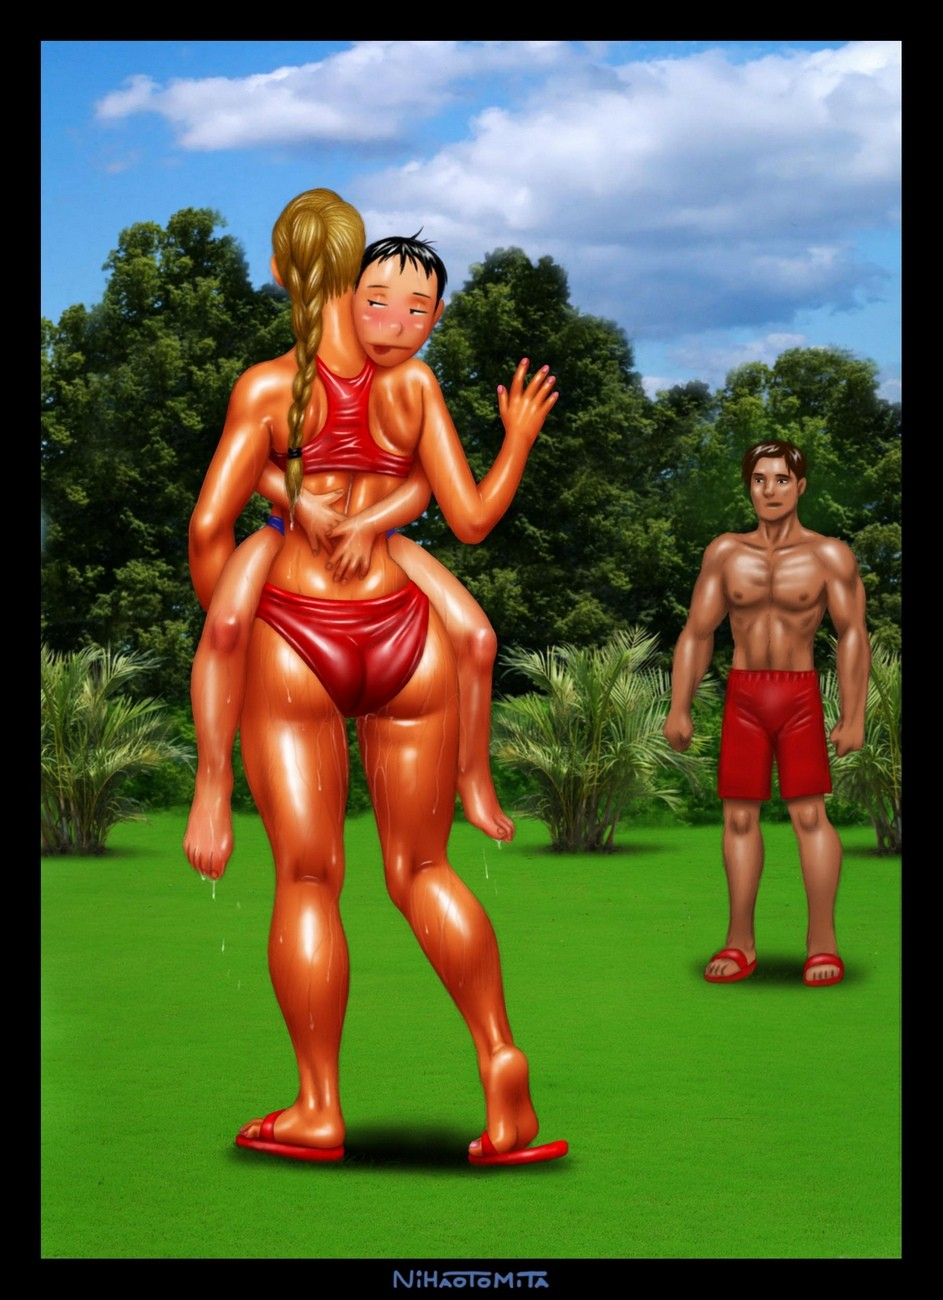 The-Lifeguard-05.jpg